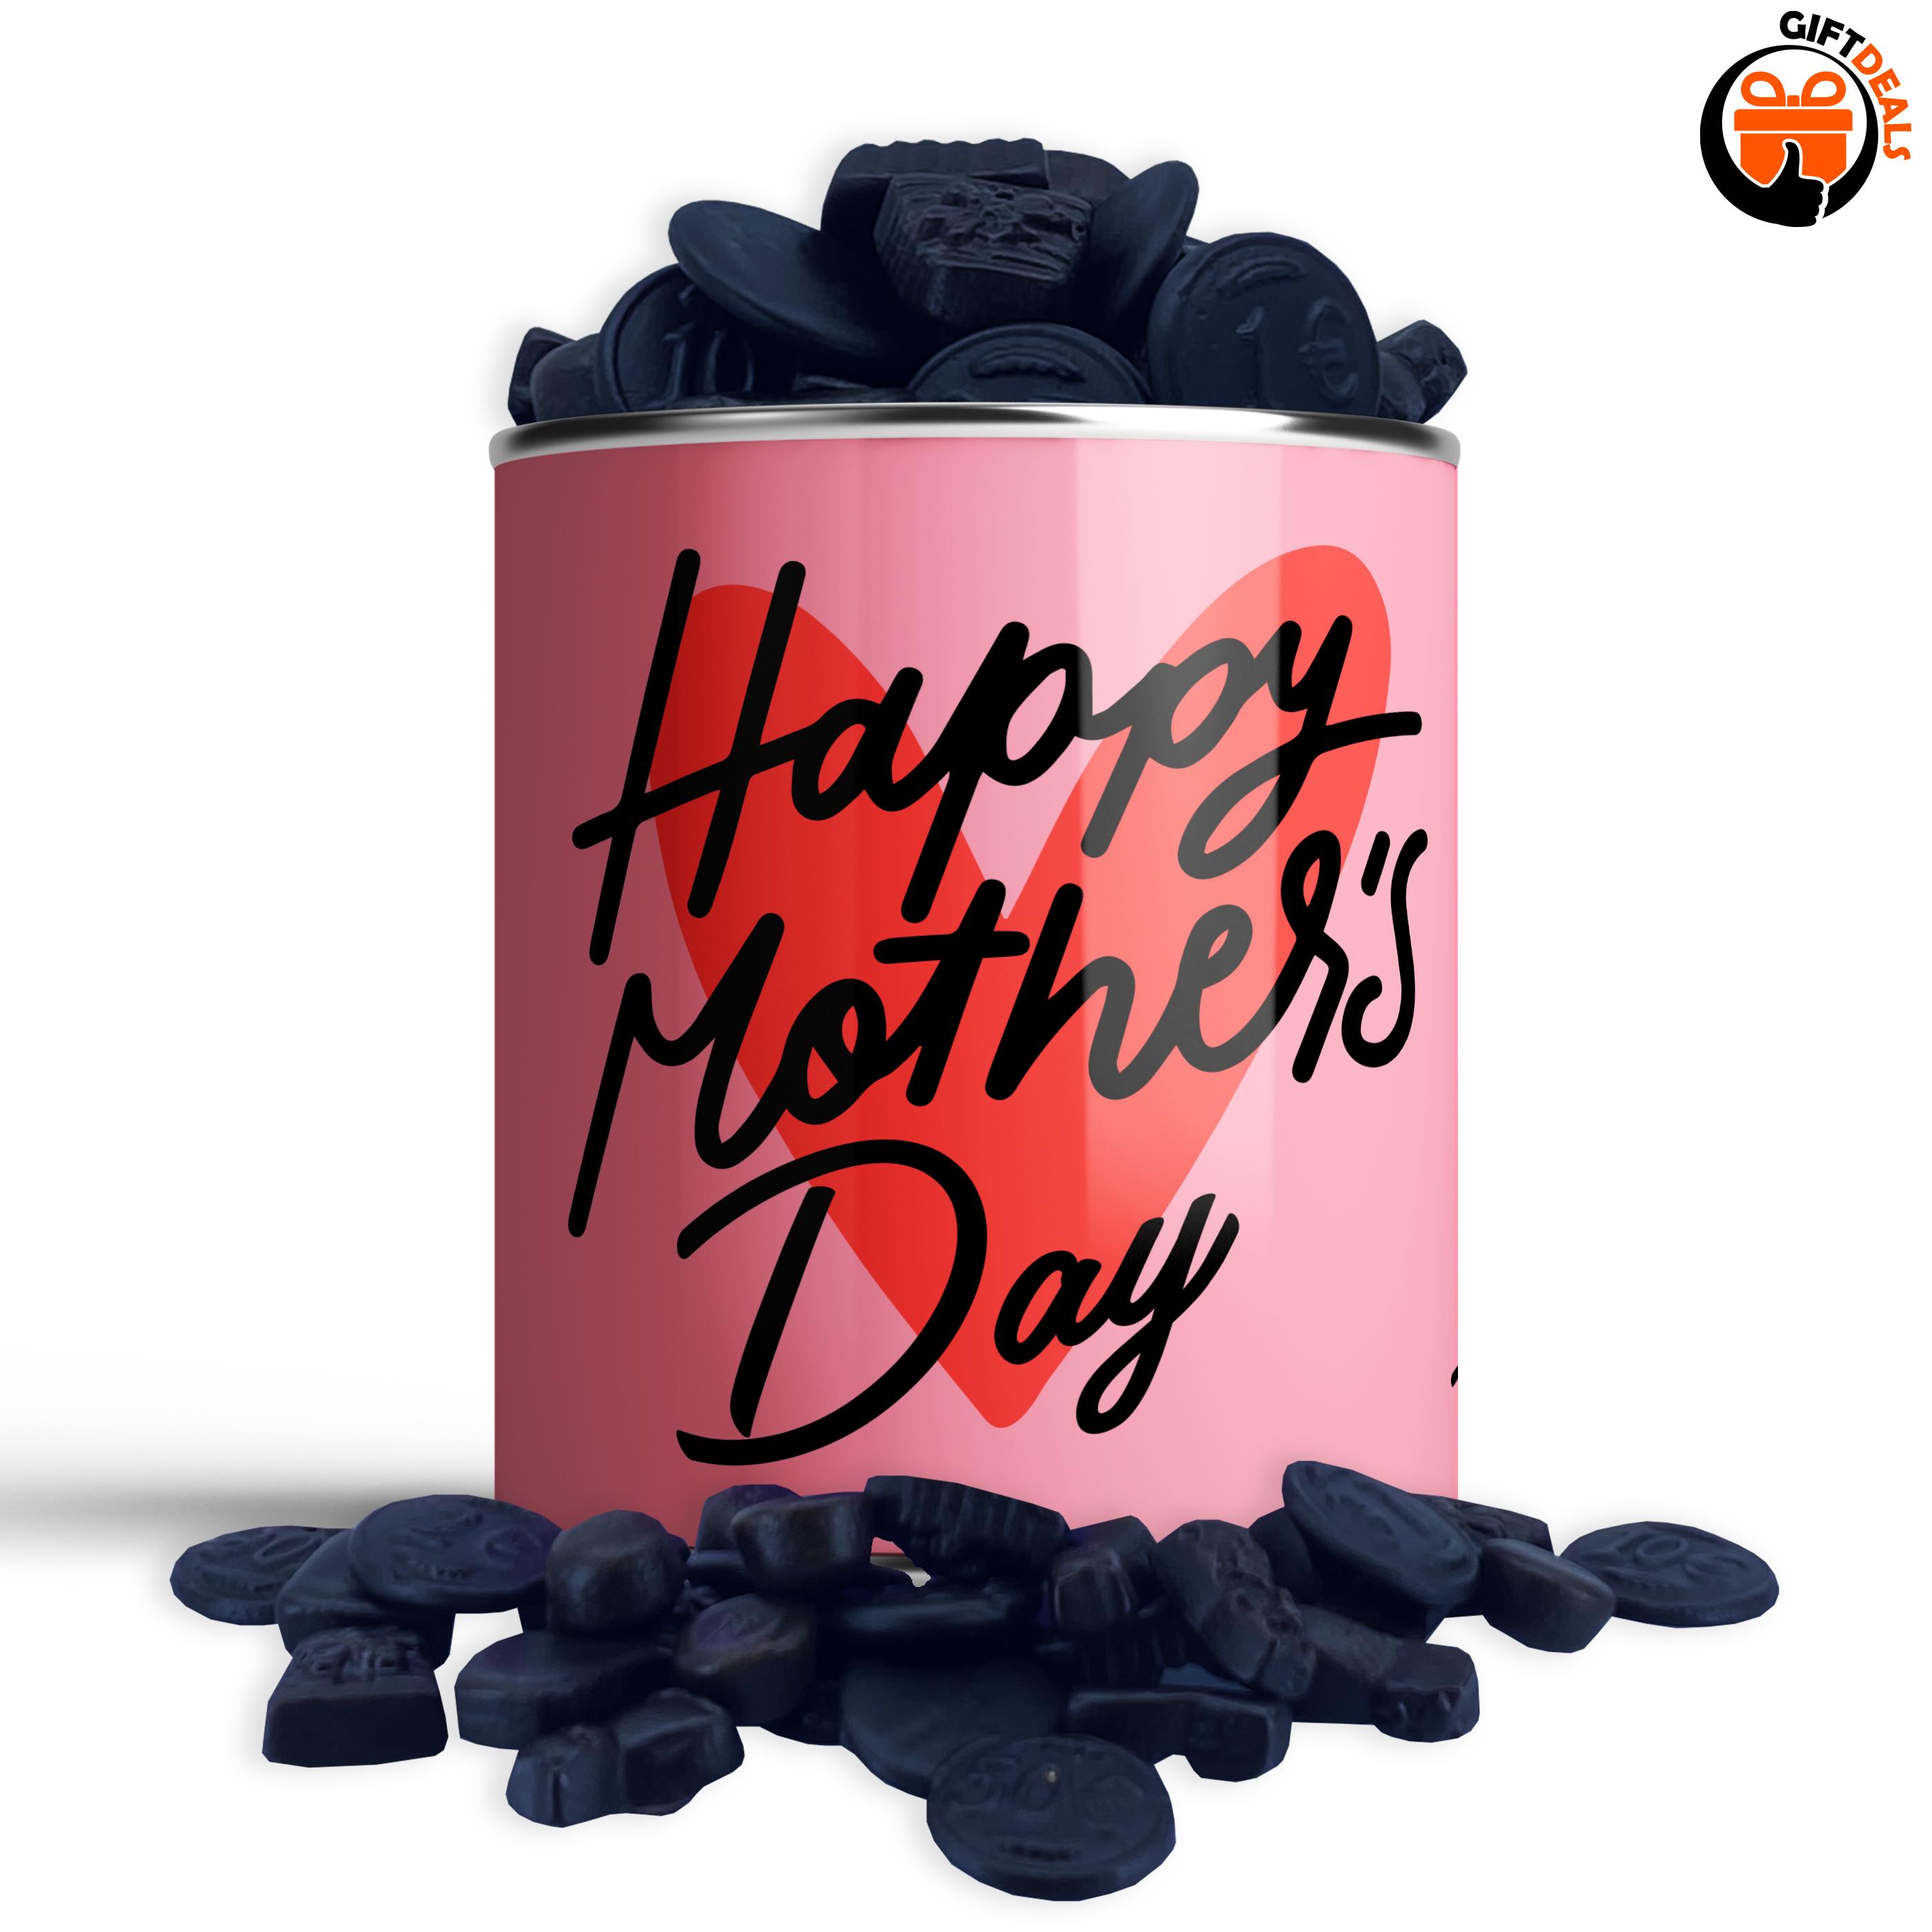 Snoepblik 'Happy Mother's Day' hart